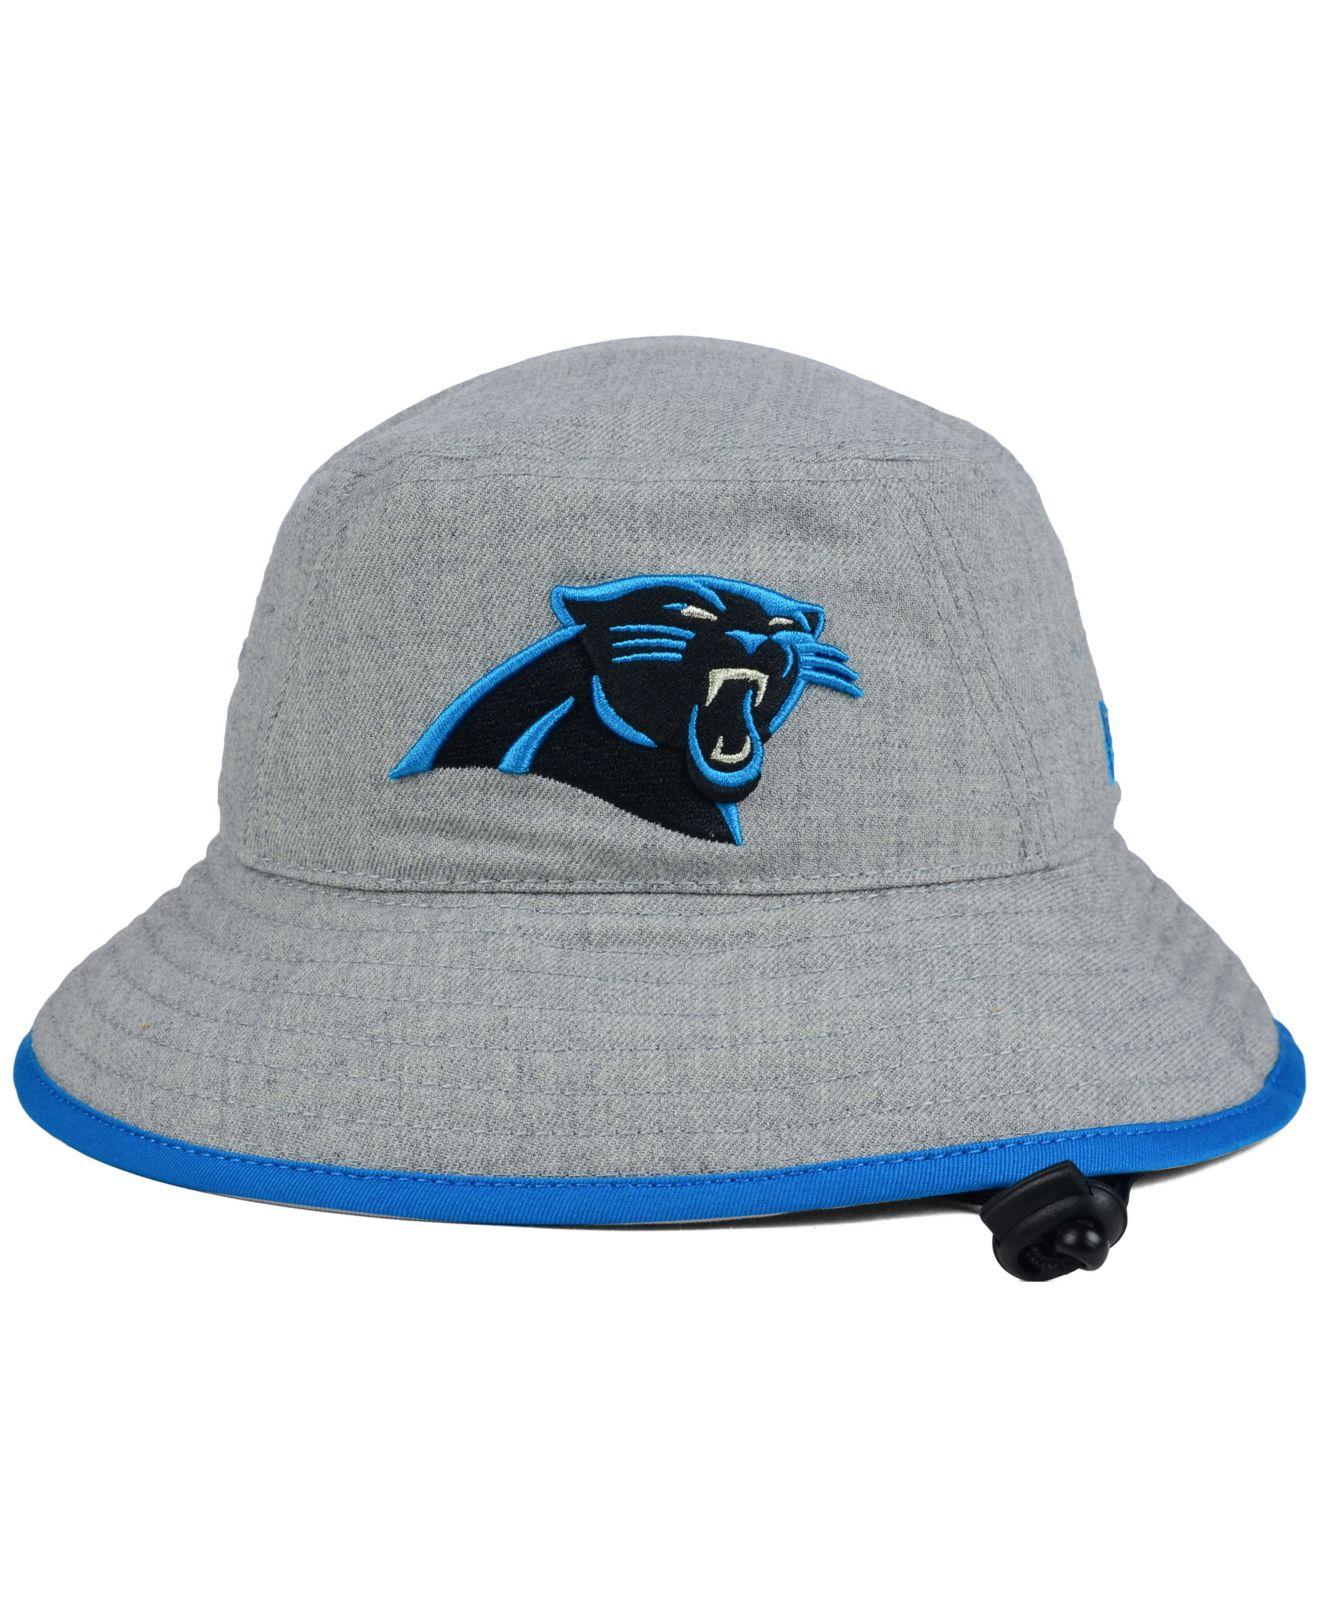 newest 7445c 2f719 ... czech lyst ktz carolina panthers nfl heather gray bucket hat in gray  for men 31dae 51cda cheap carolina panthers the team script snapback ...